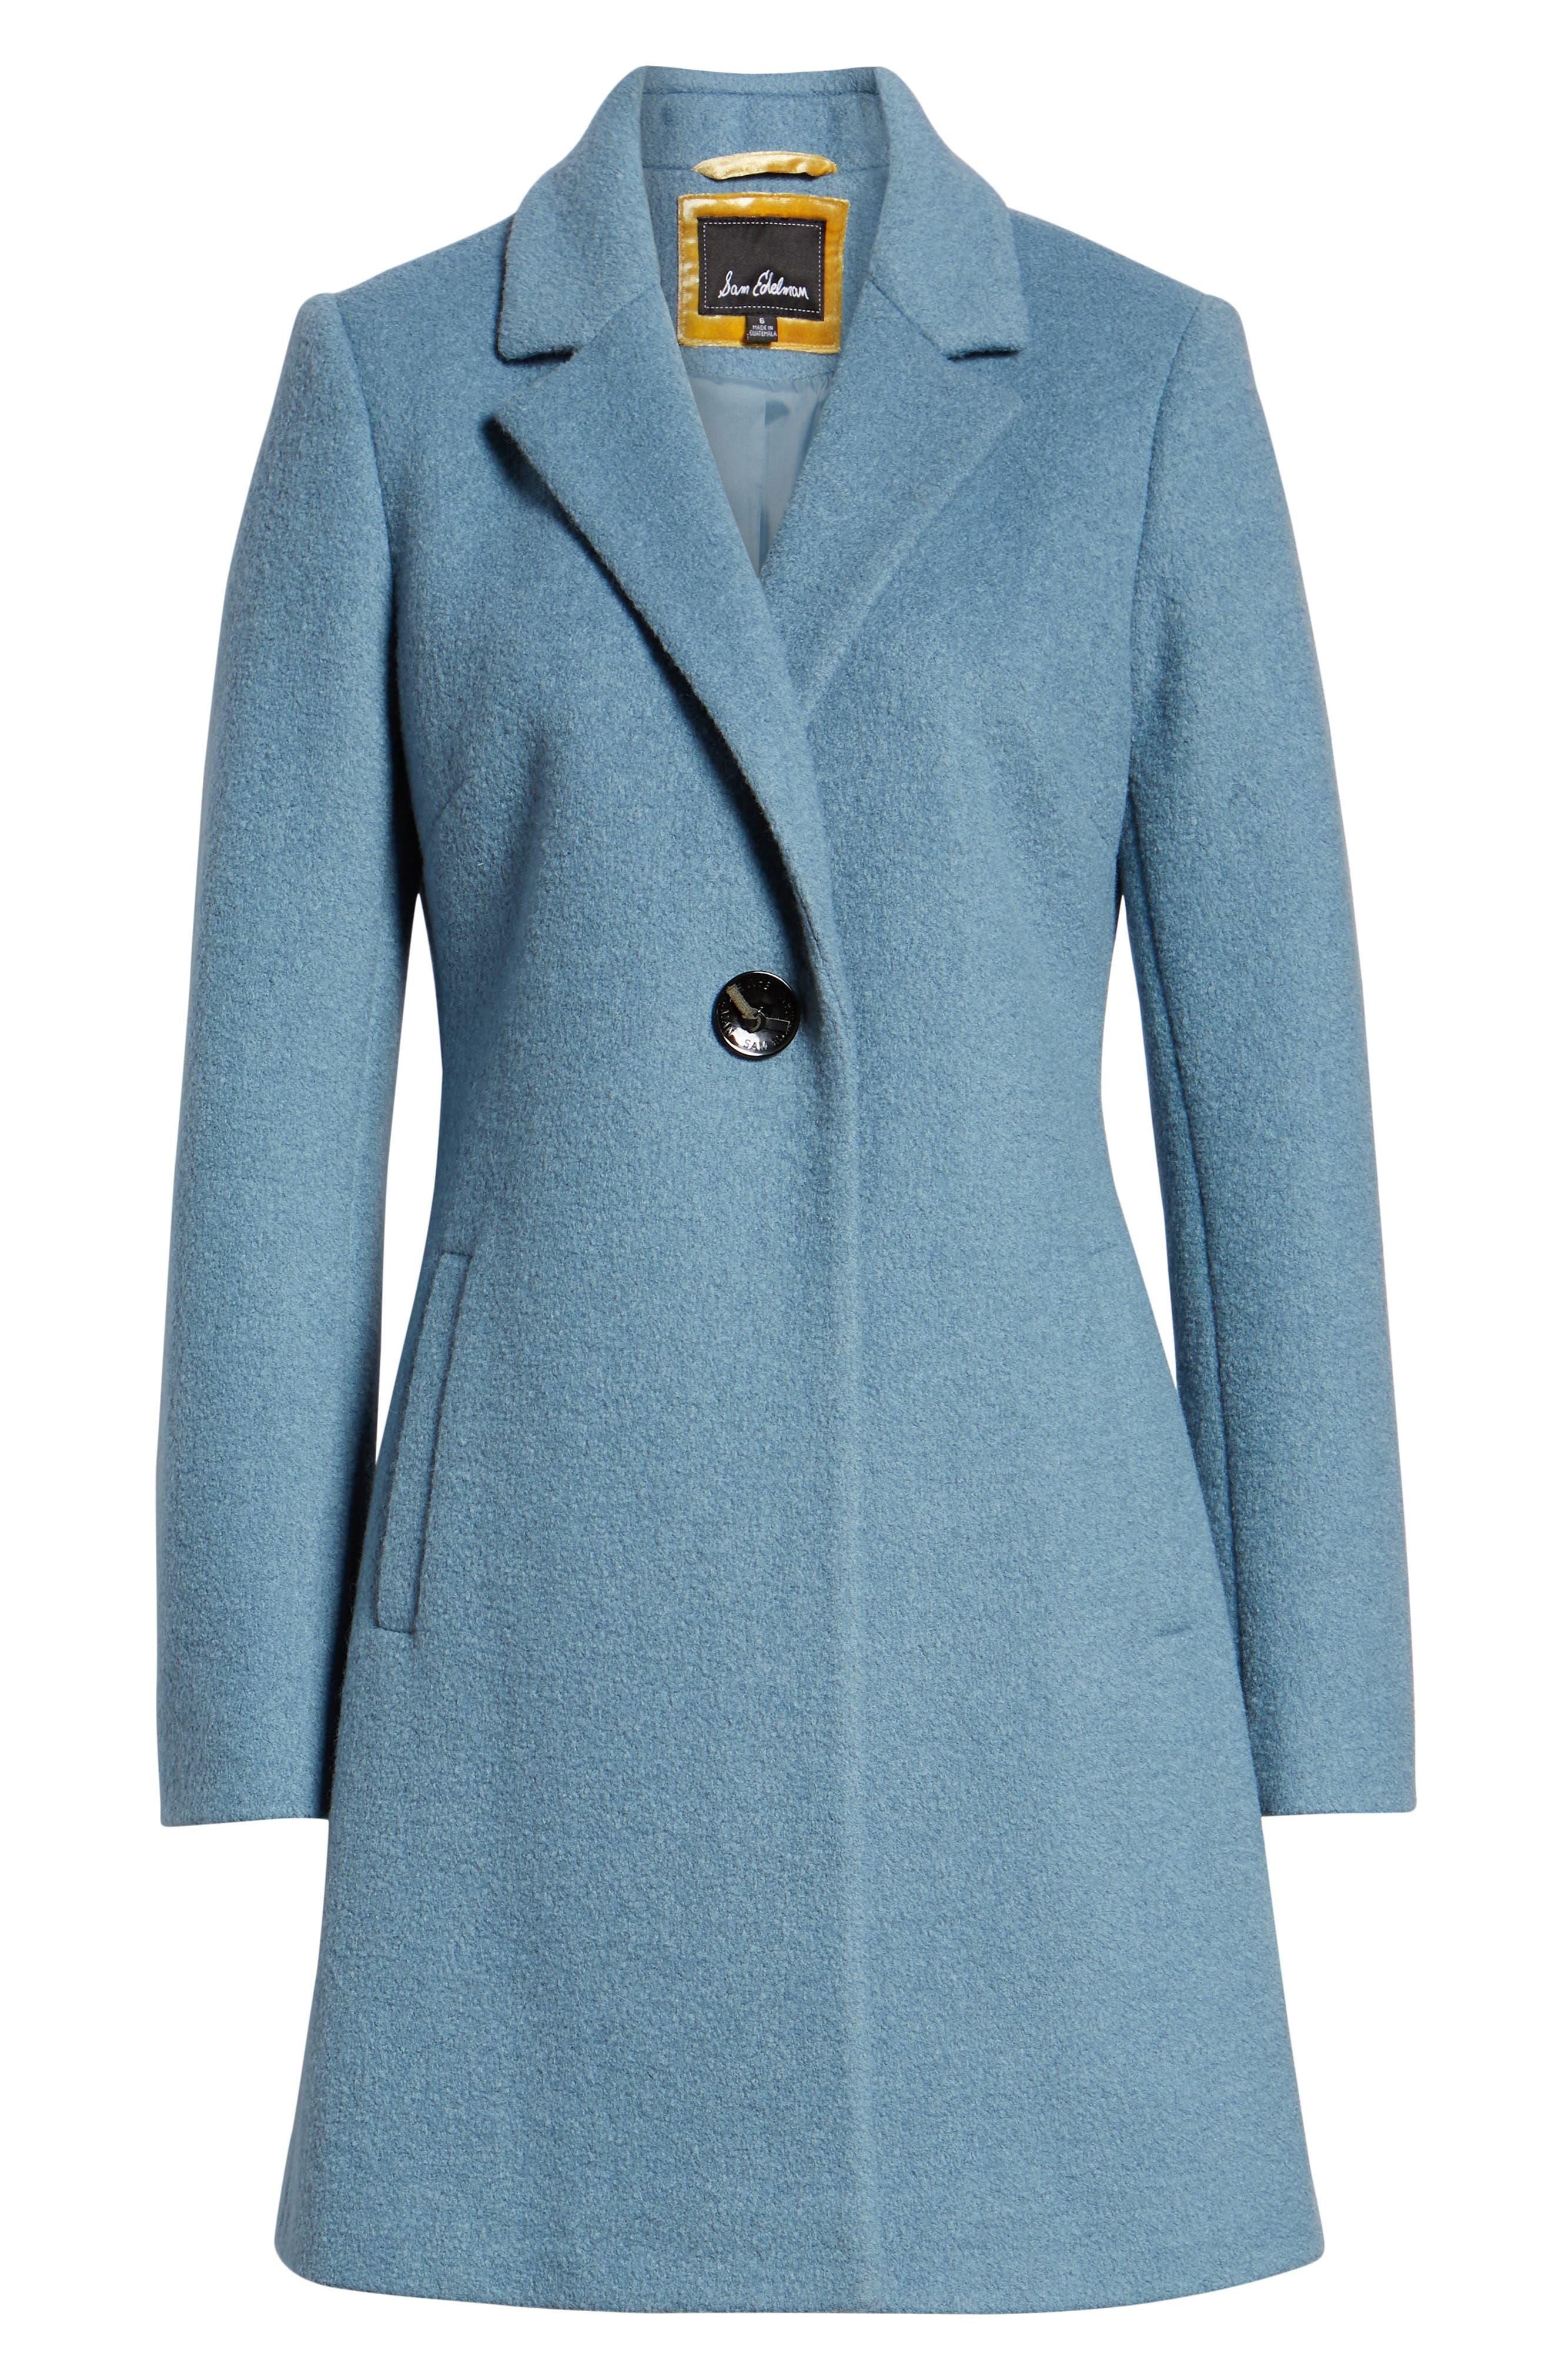 Blazer Jacket,                             Alternate thumbnail 6, color,                             LIGHT BLUE